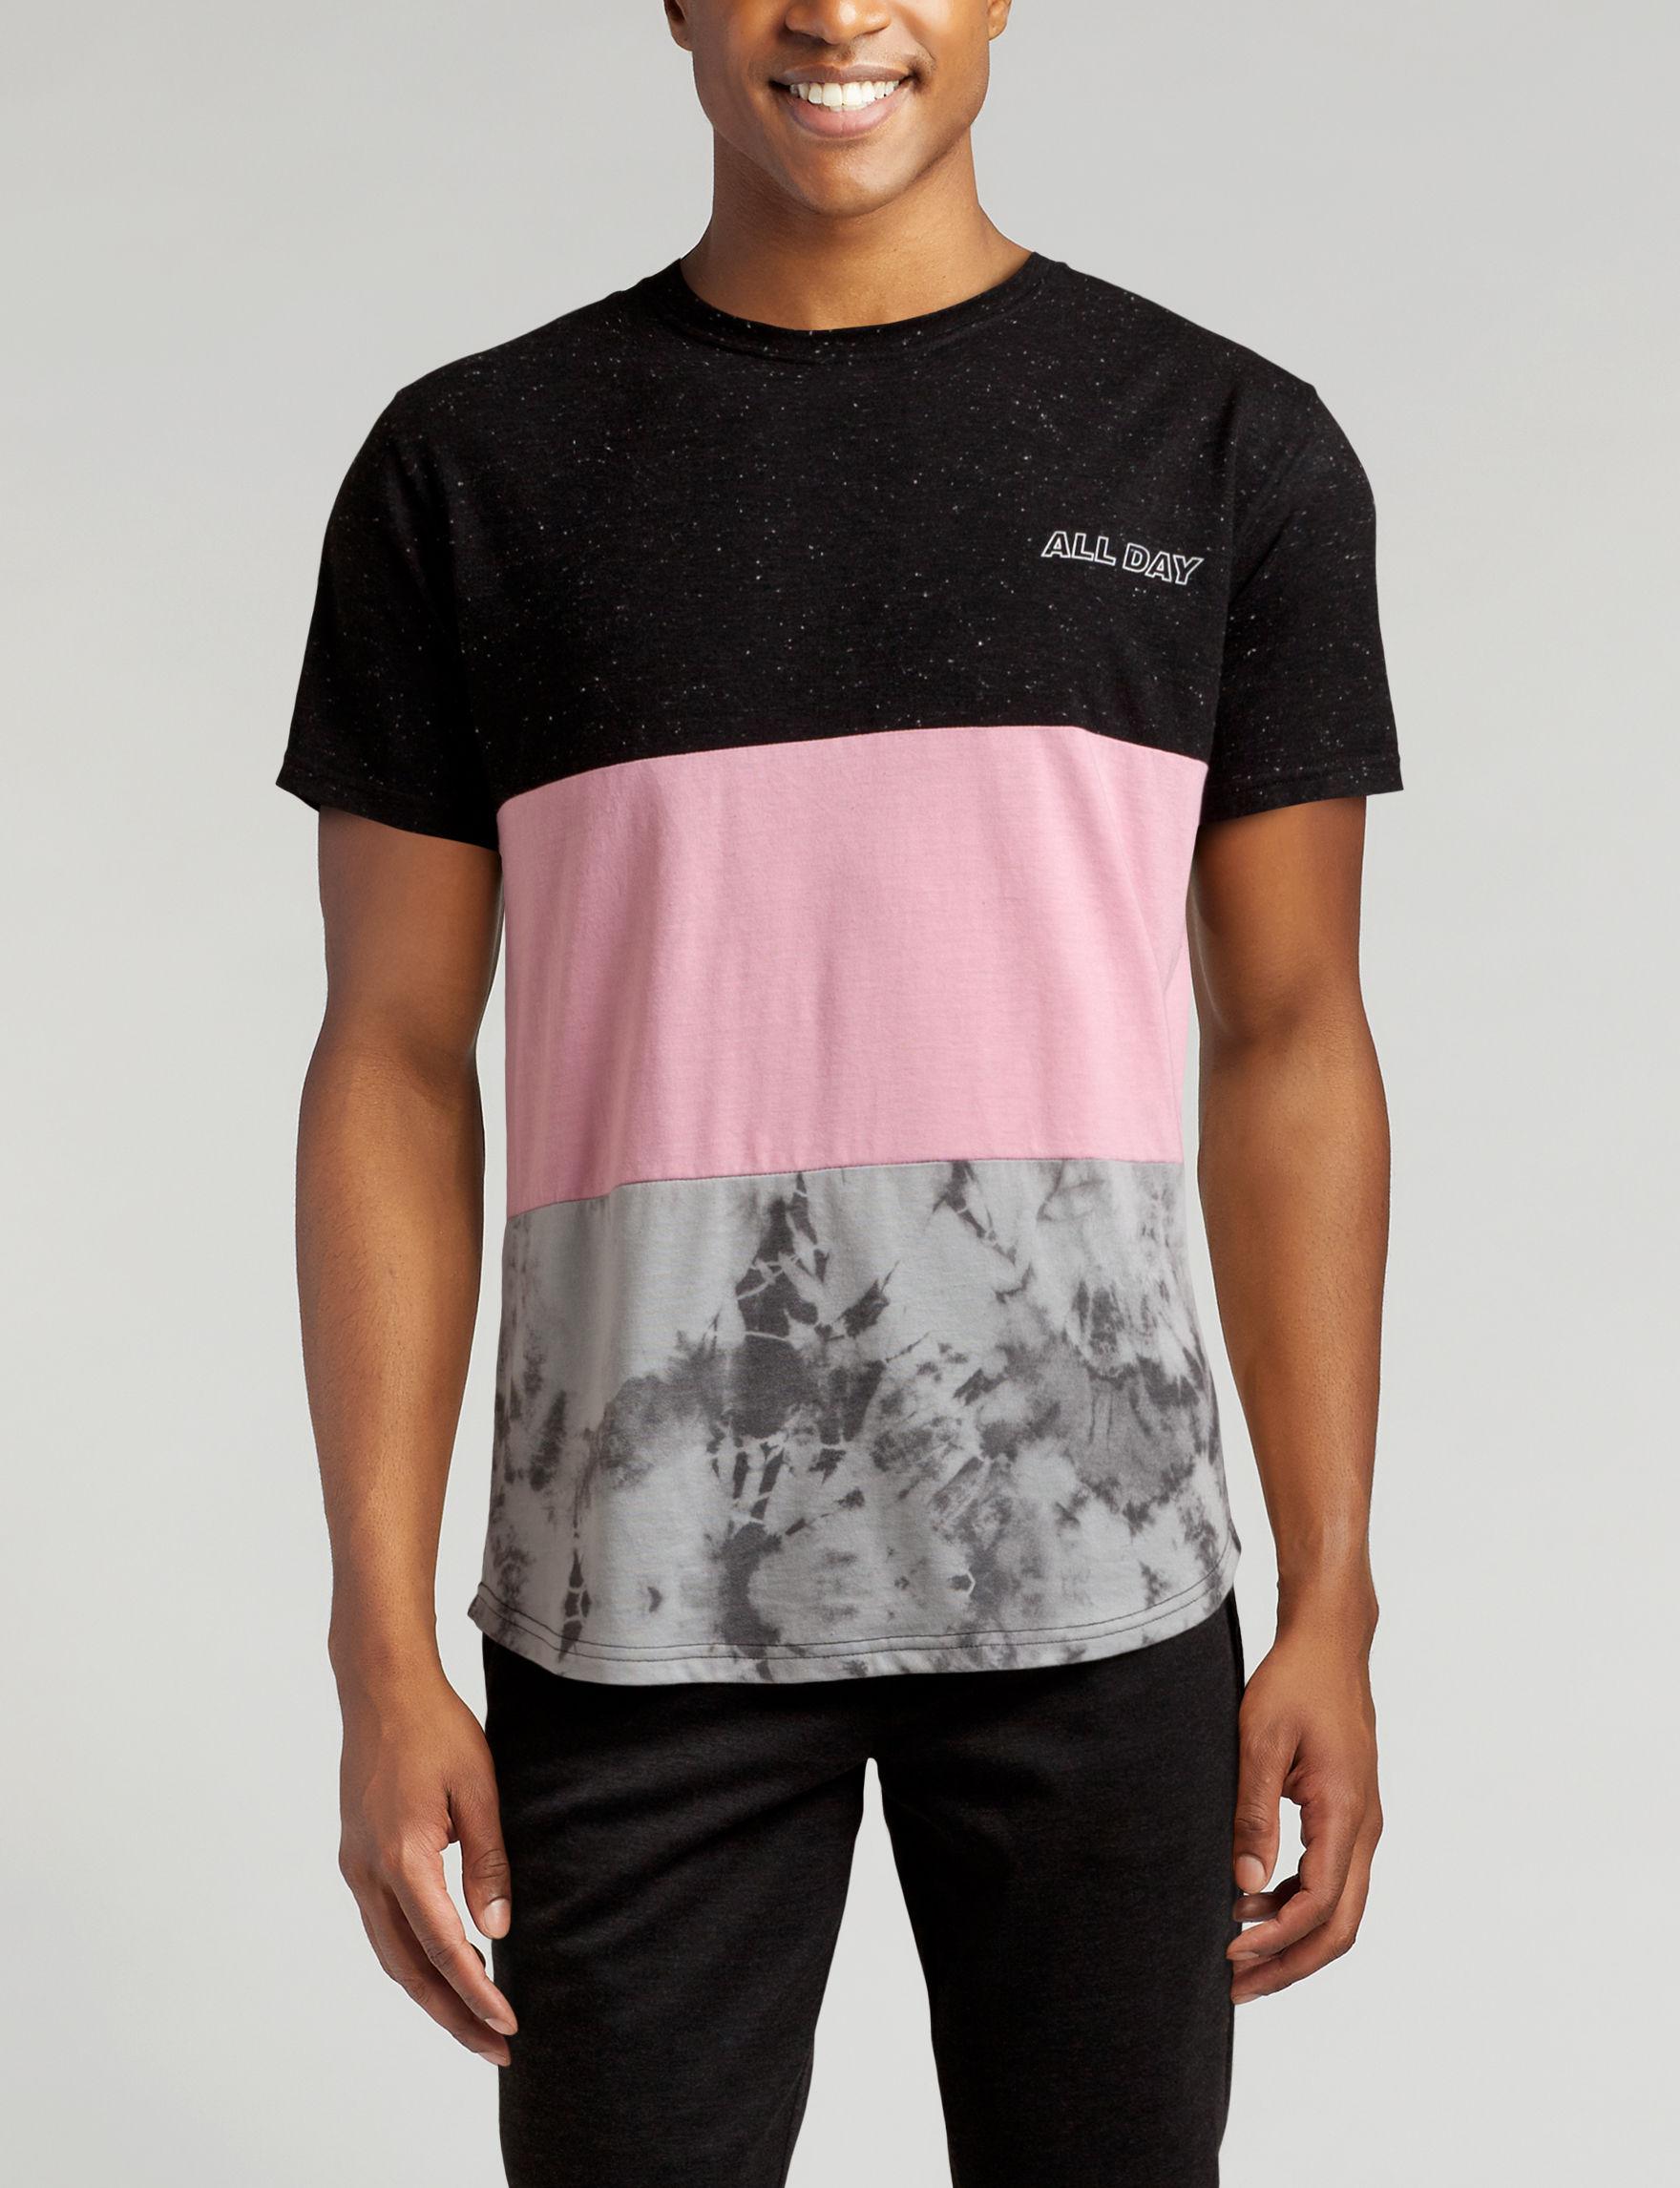 Vibes Black / Pink Tees & Tanks